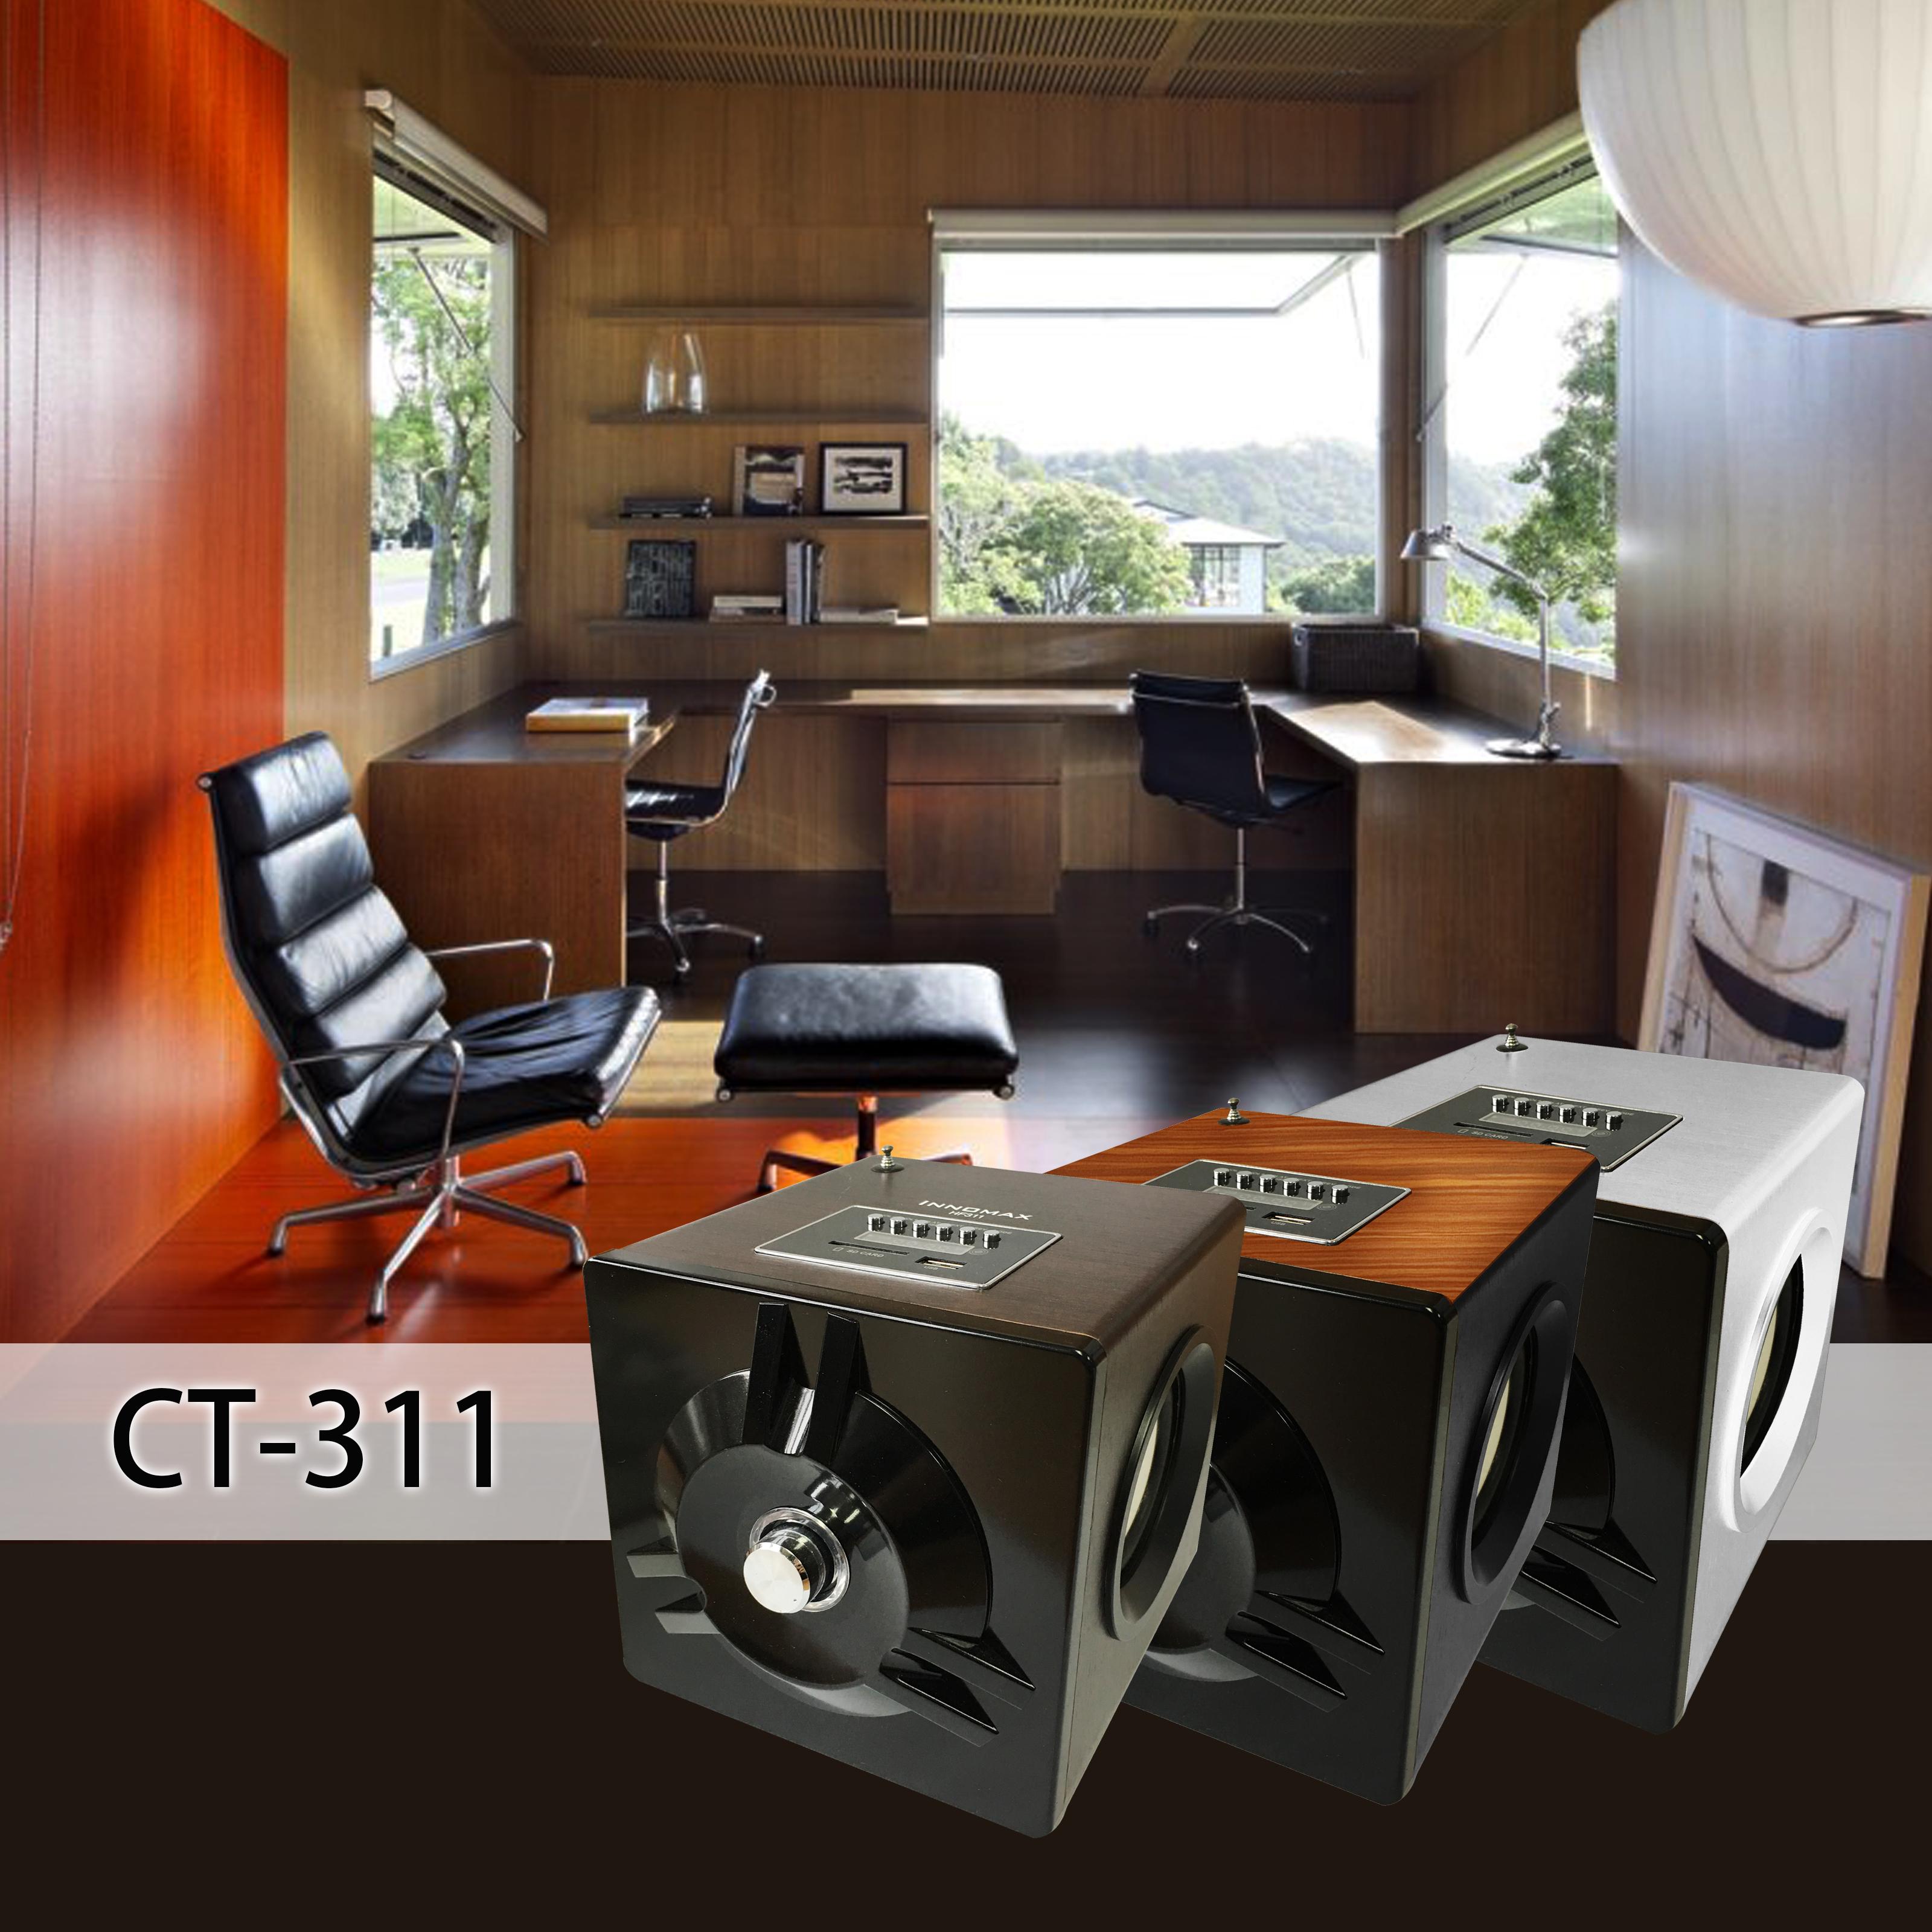 CT-311 home office .jpg